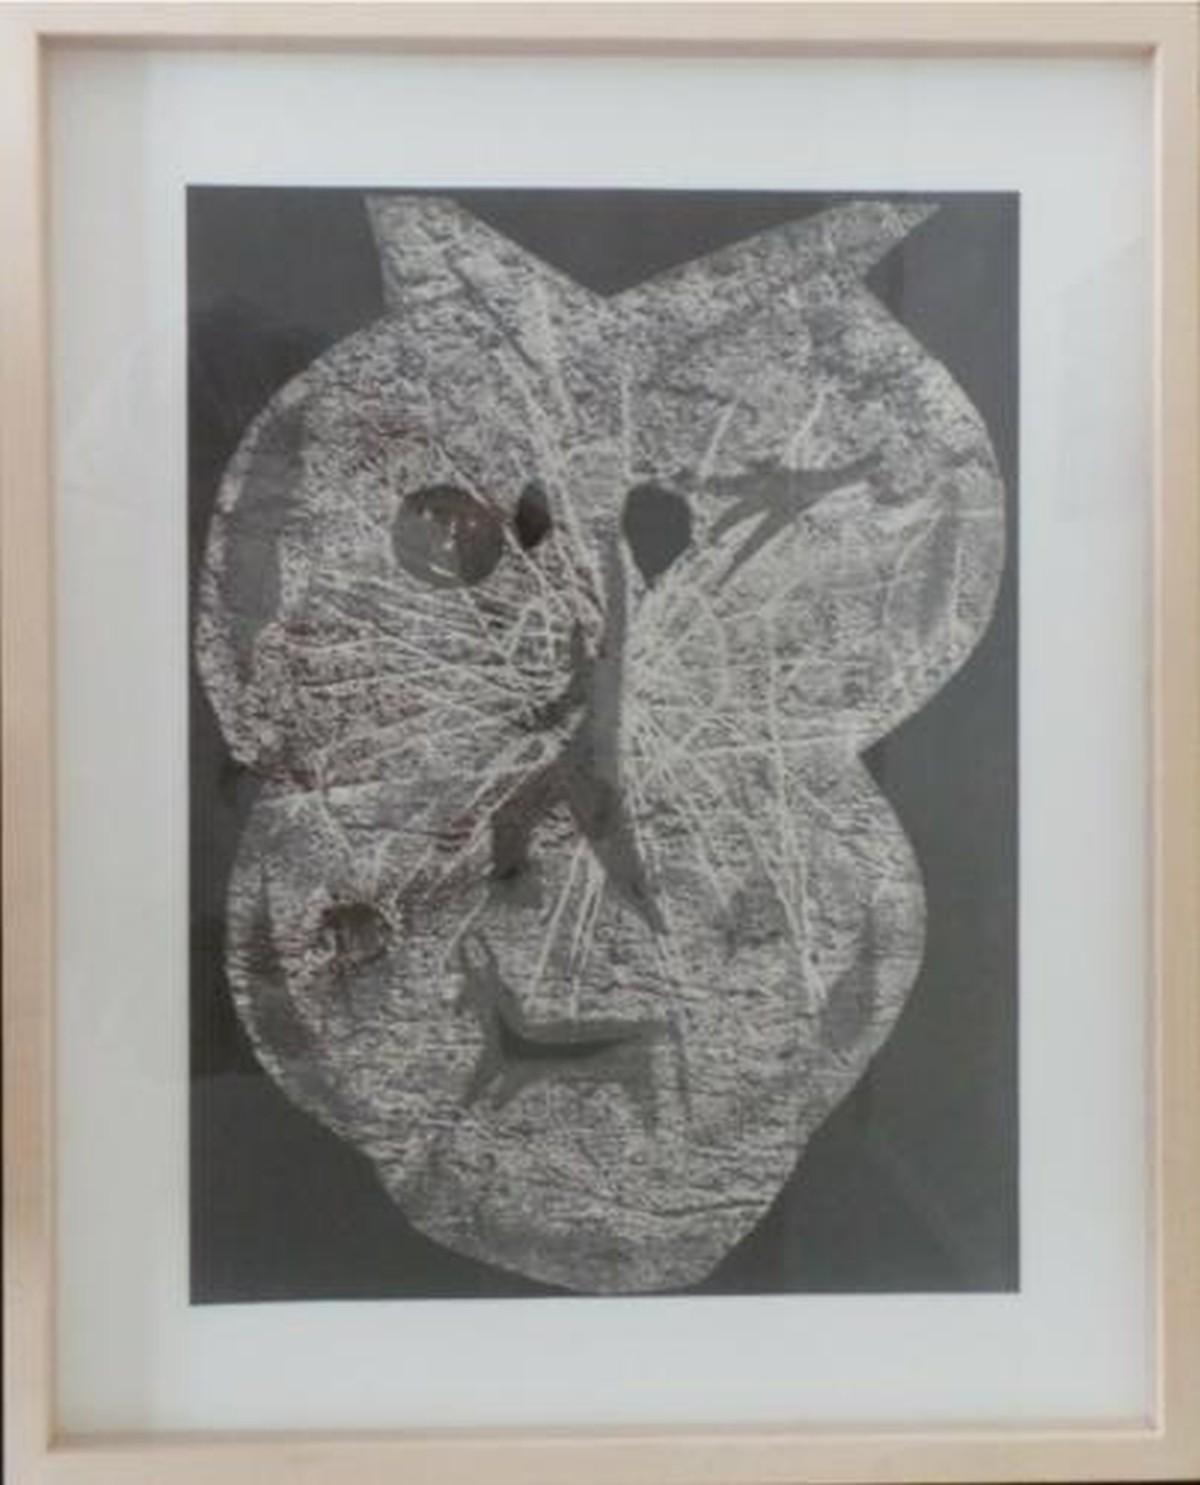 Pablo Picasso - Diurnes Picasso / Andre Villers 1962 Berggruen kopen? Bied vanaf 240!